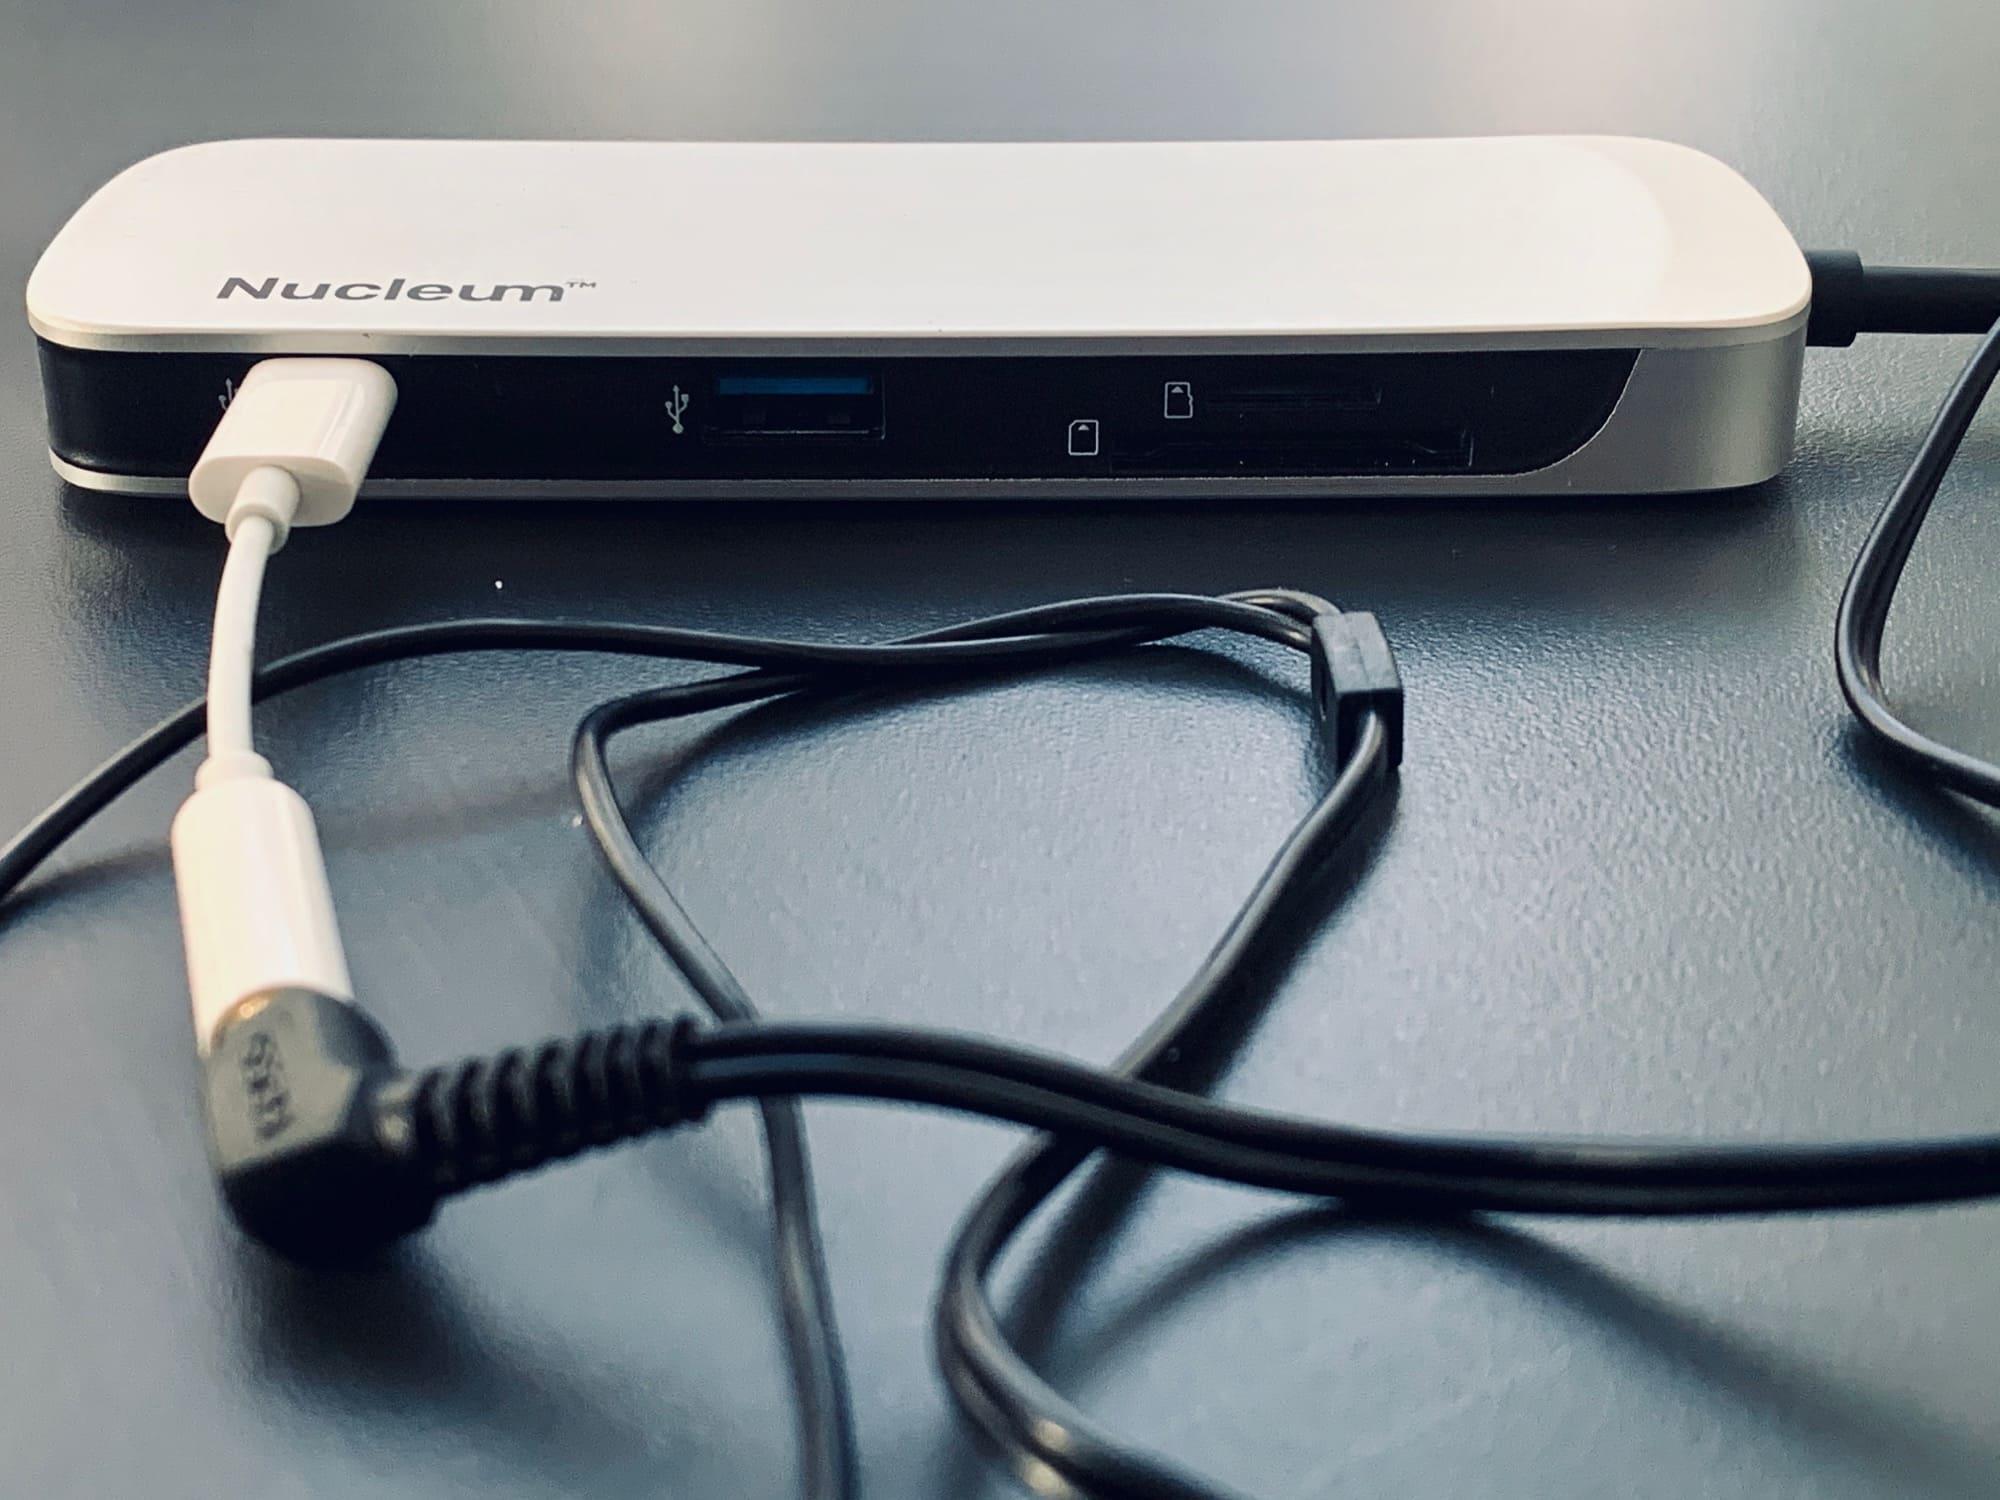 USB-C headphone adapter